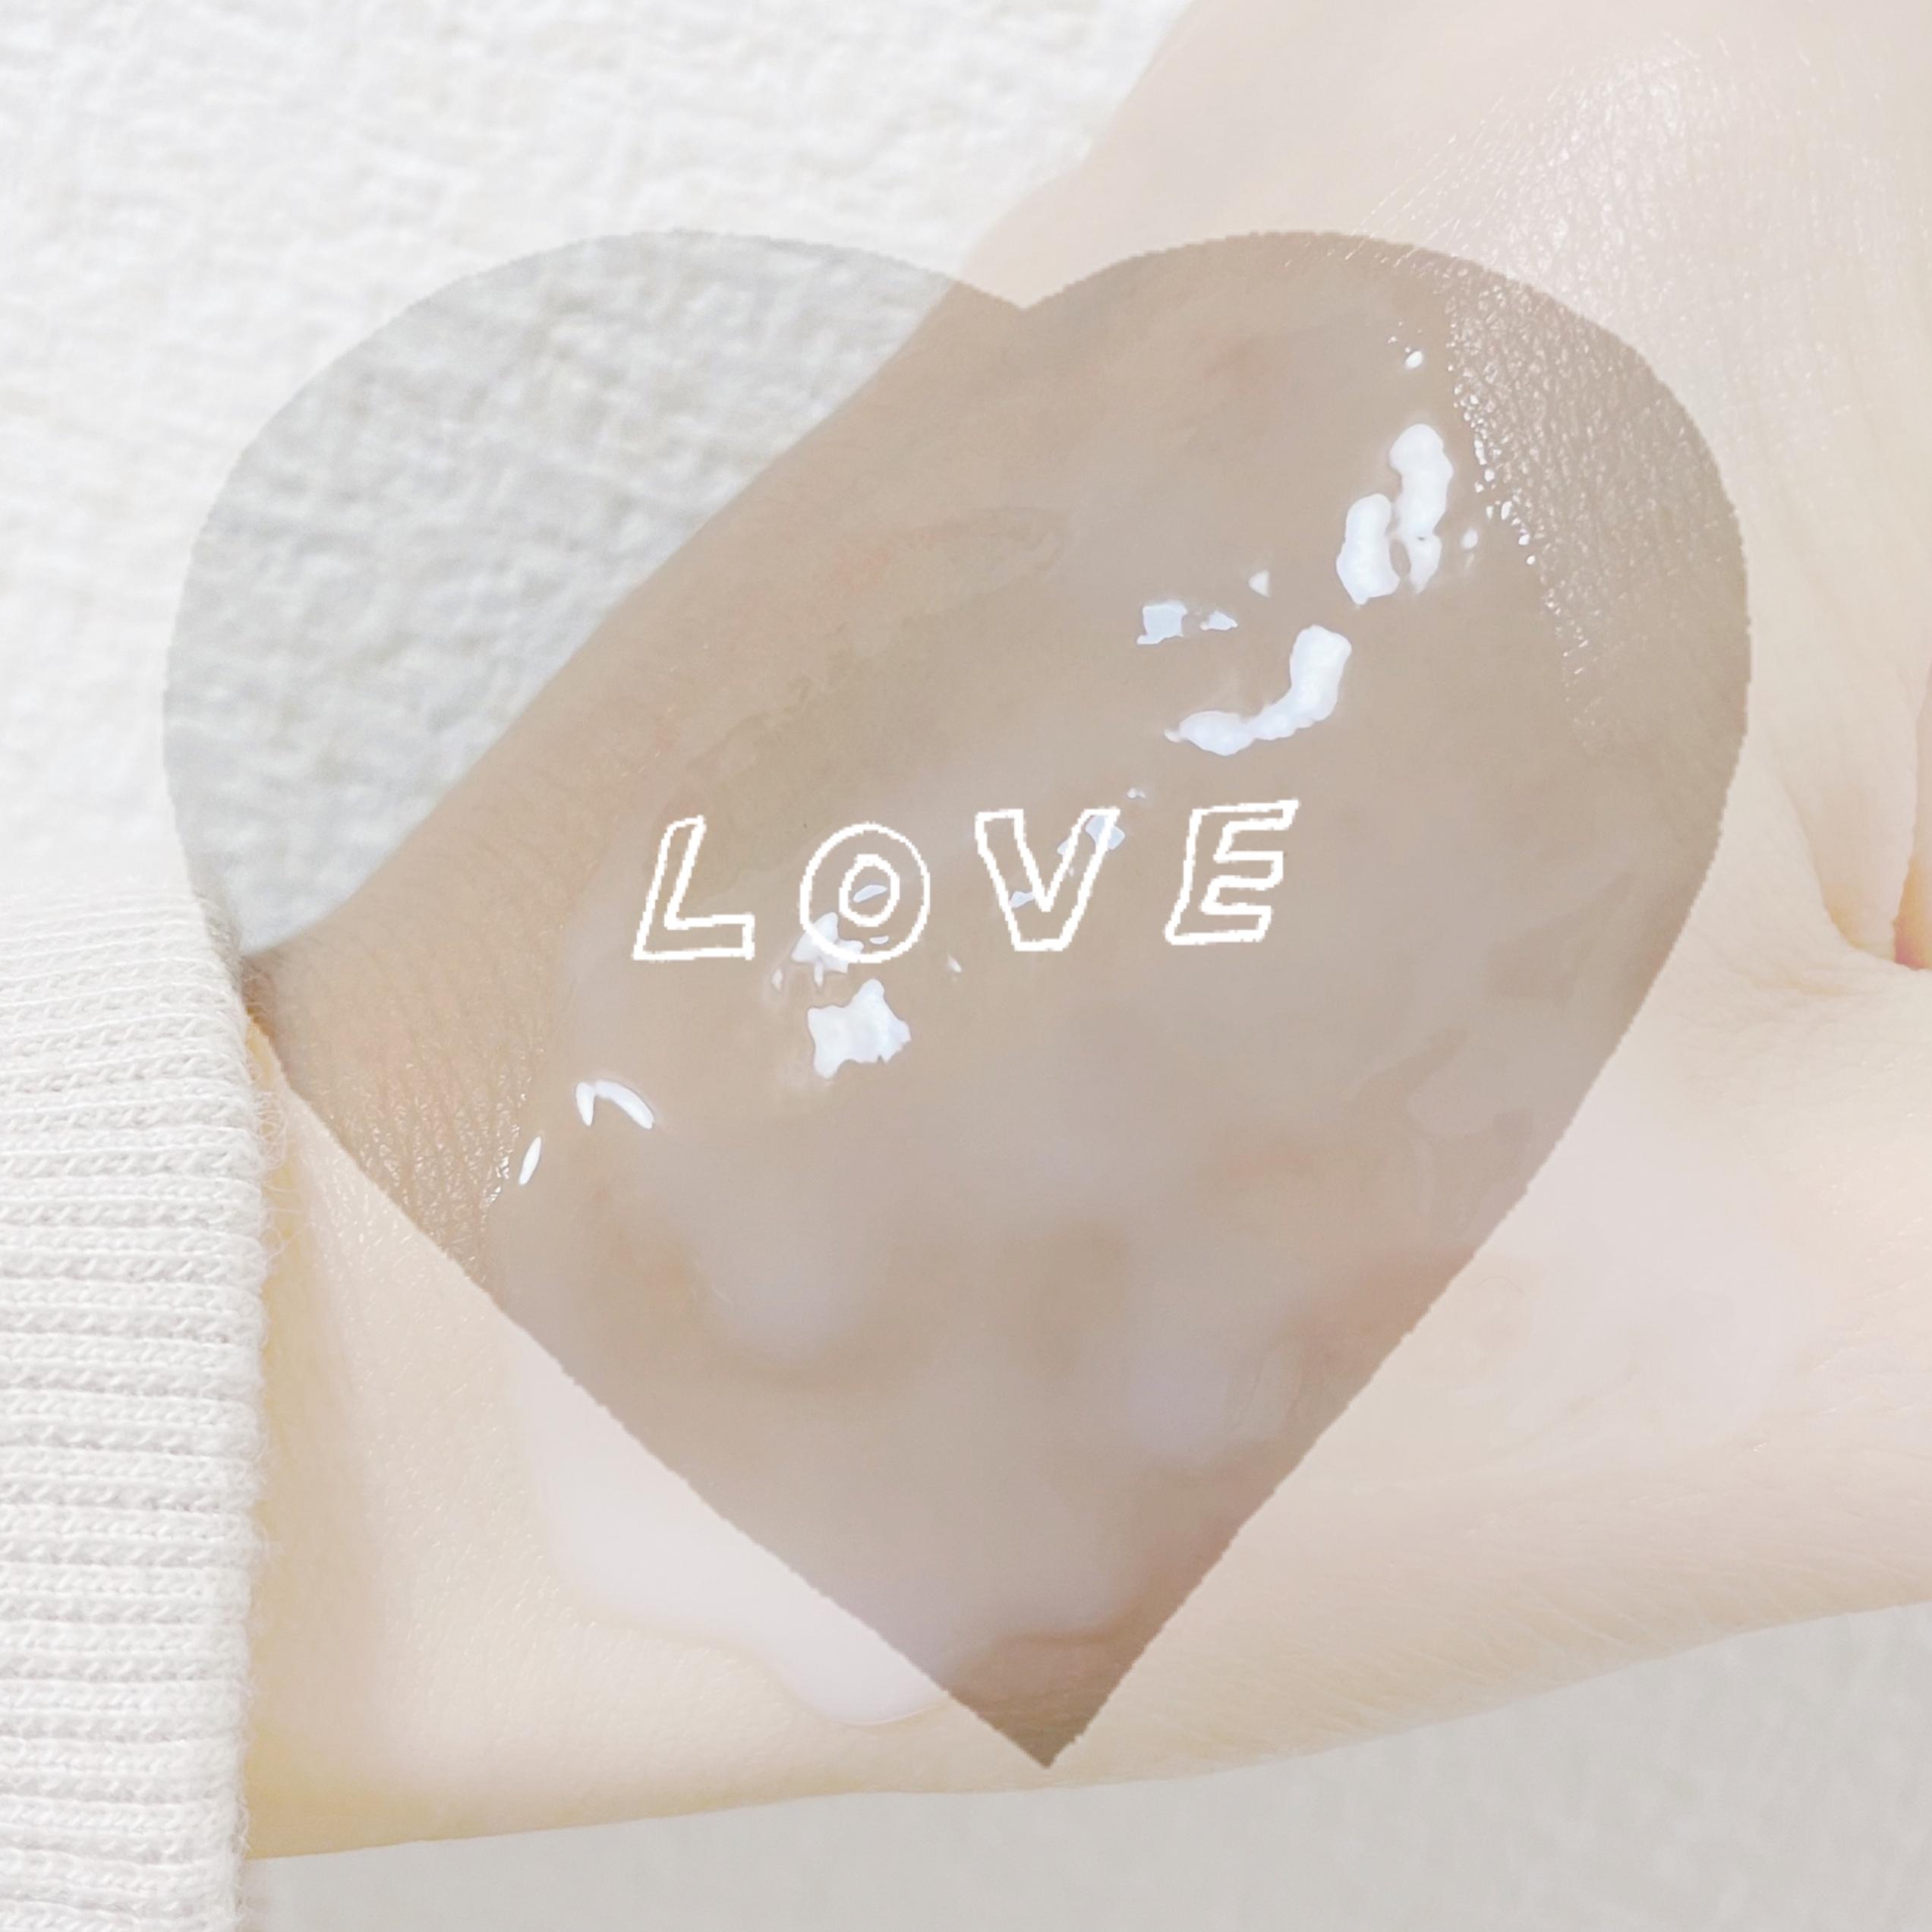 BiBika(ビビカ) クレンジングジェルミルクの良い点・メリットに関する大崎美佳さんの口コミ画像1